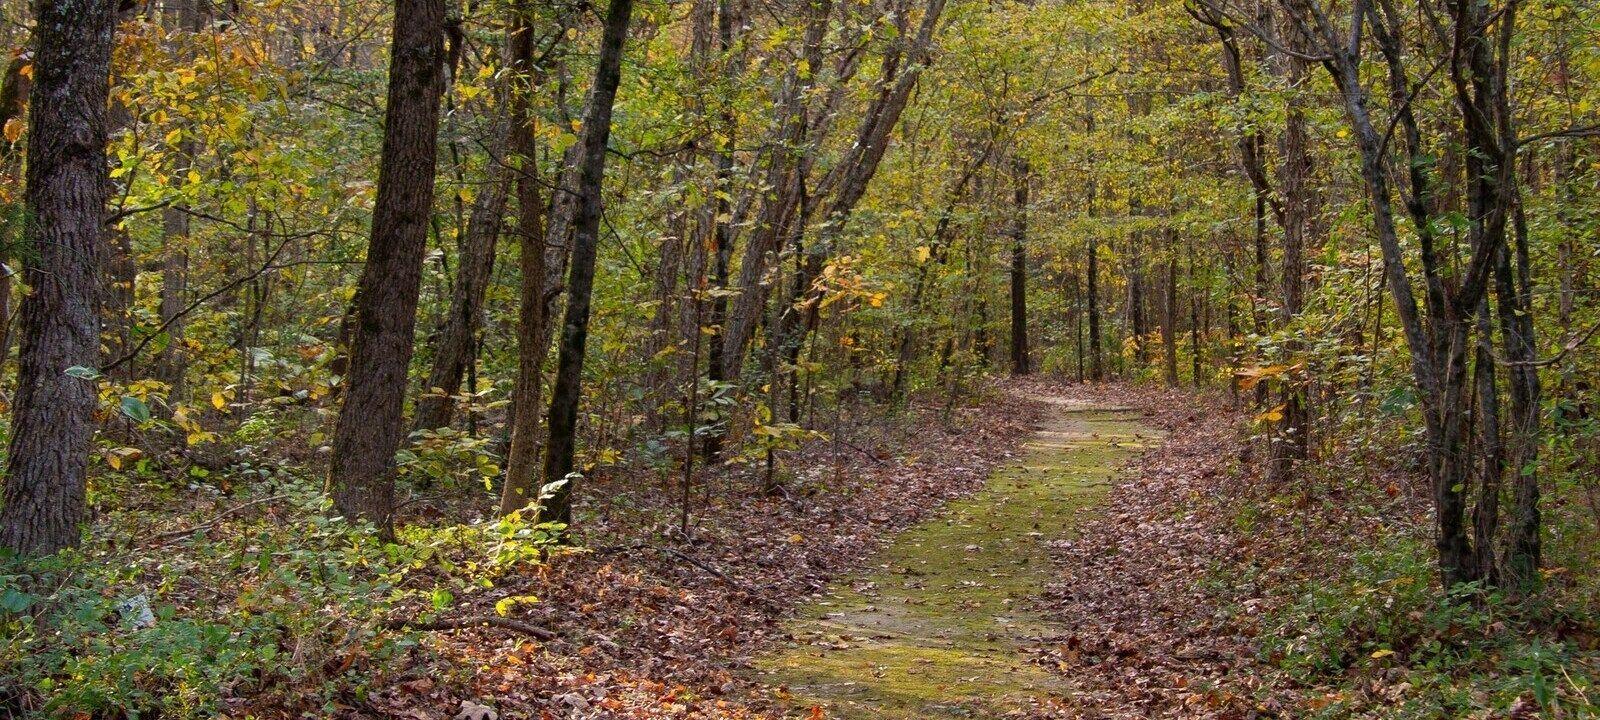 Explore nature and the Underground Railroad